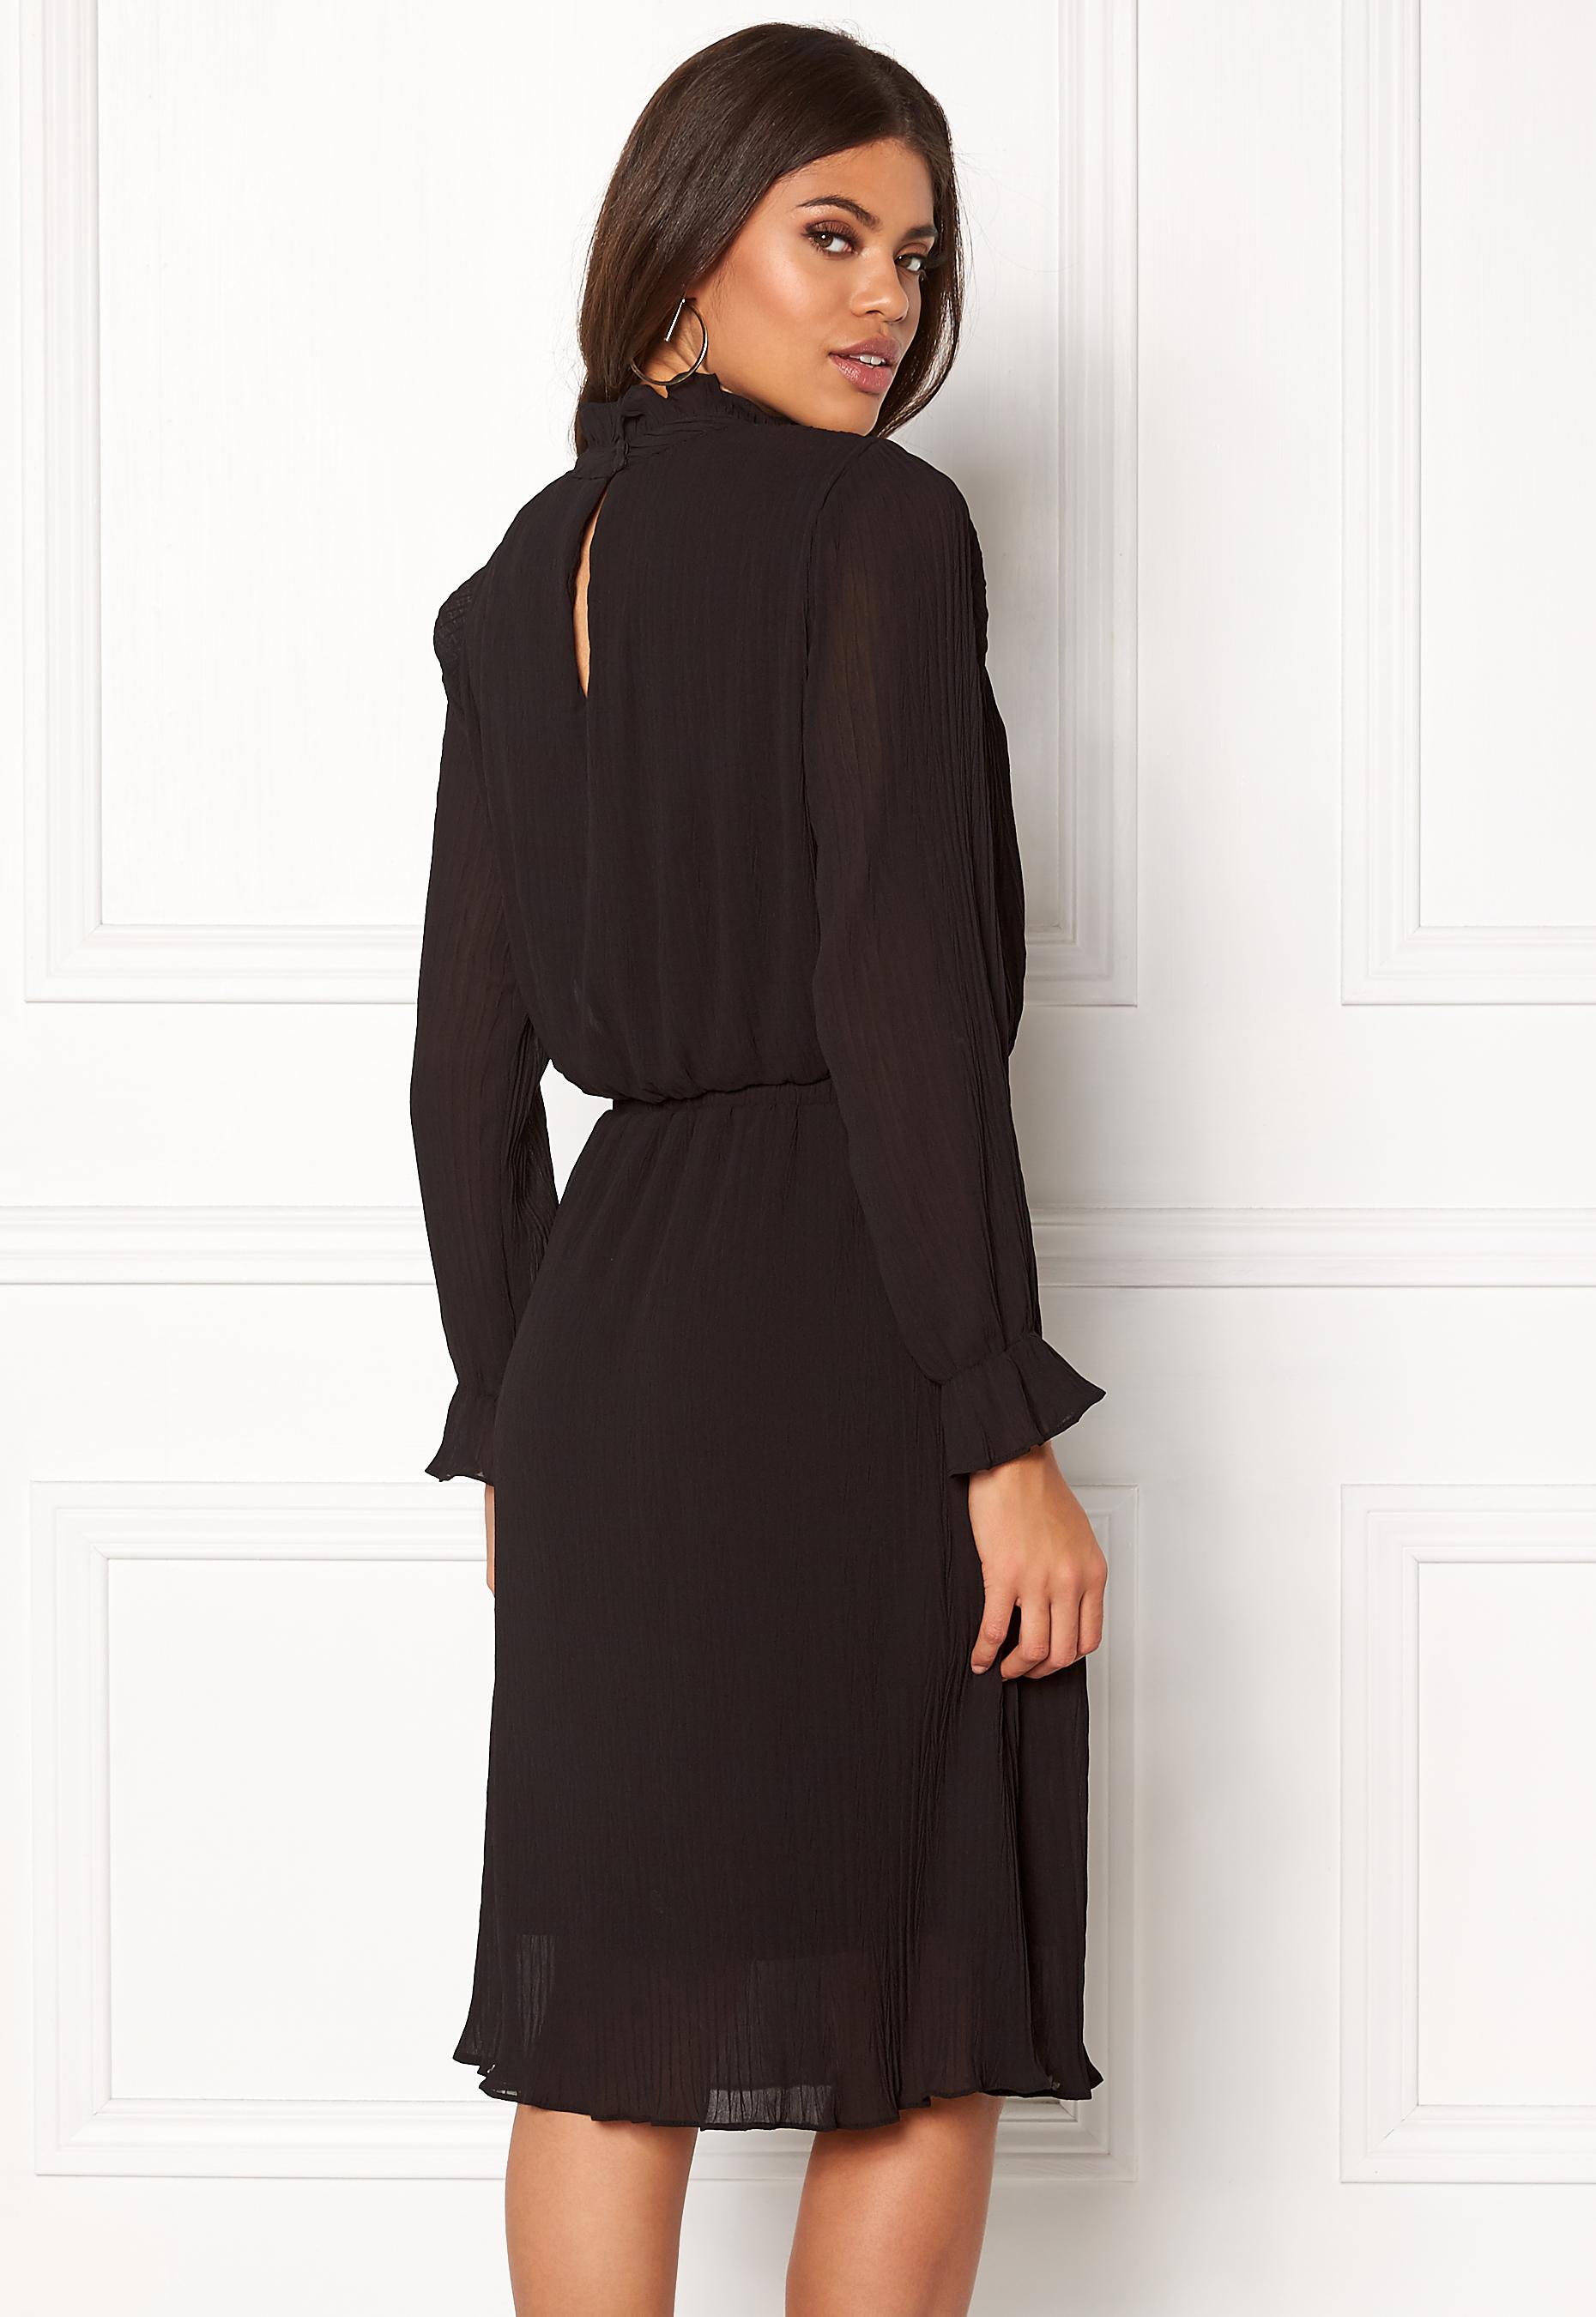 d700121802b4 Dress Ichi Blair Black Bubbleroom Blair Ichi trtpwxgqv